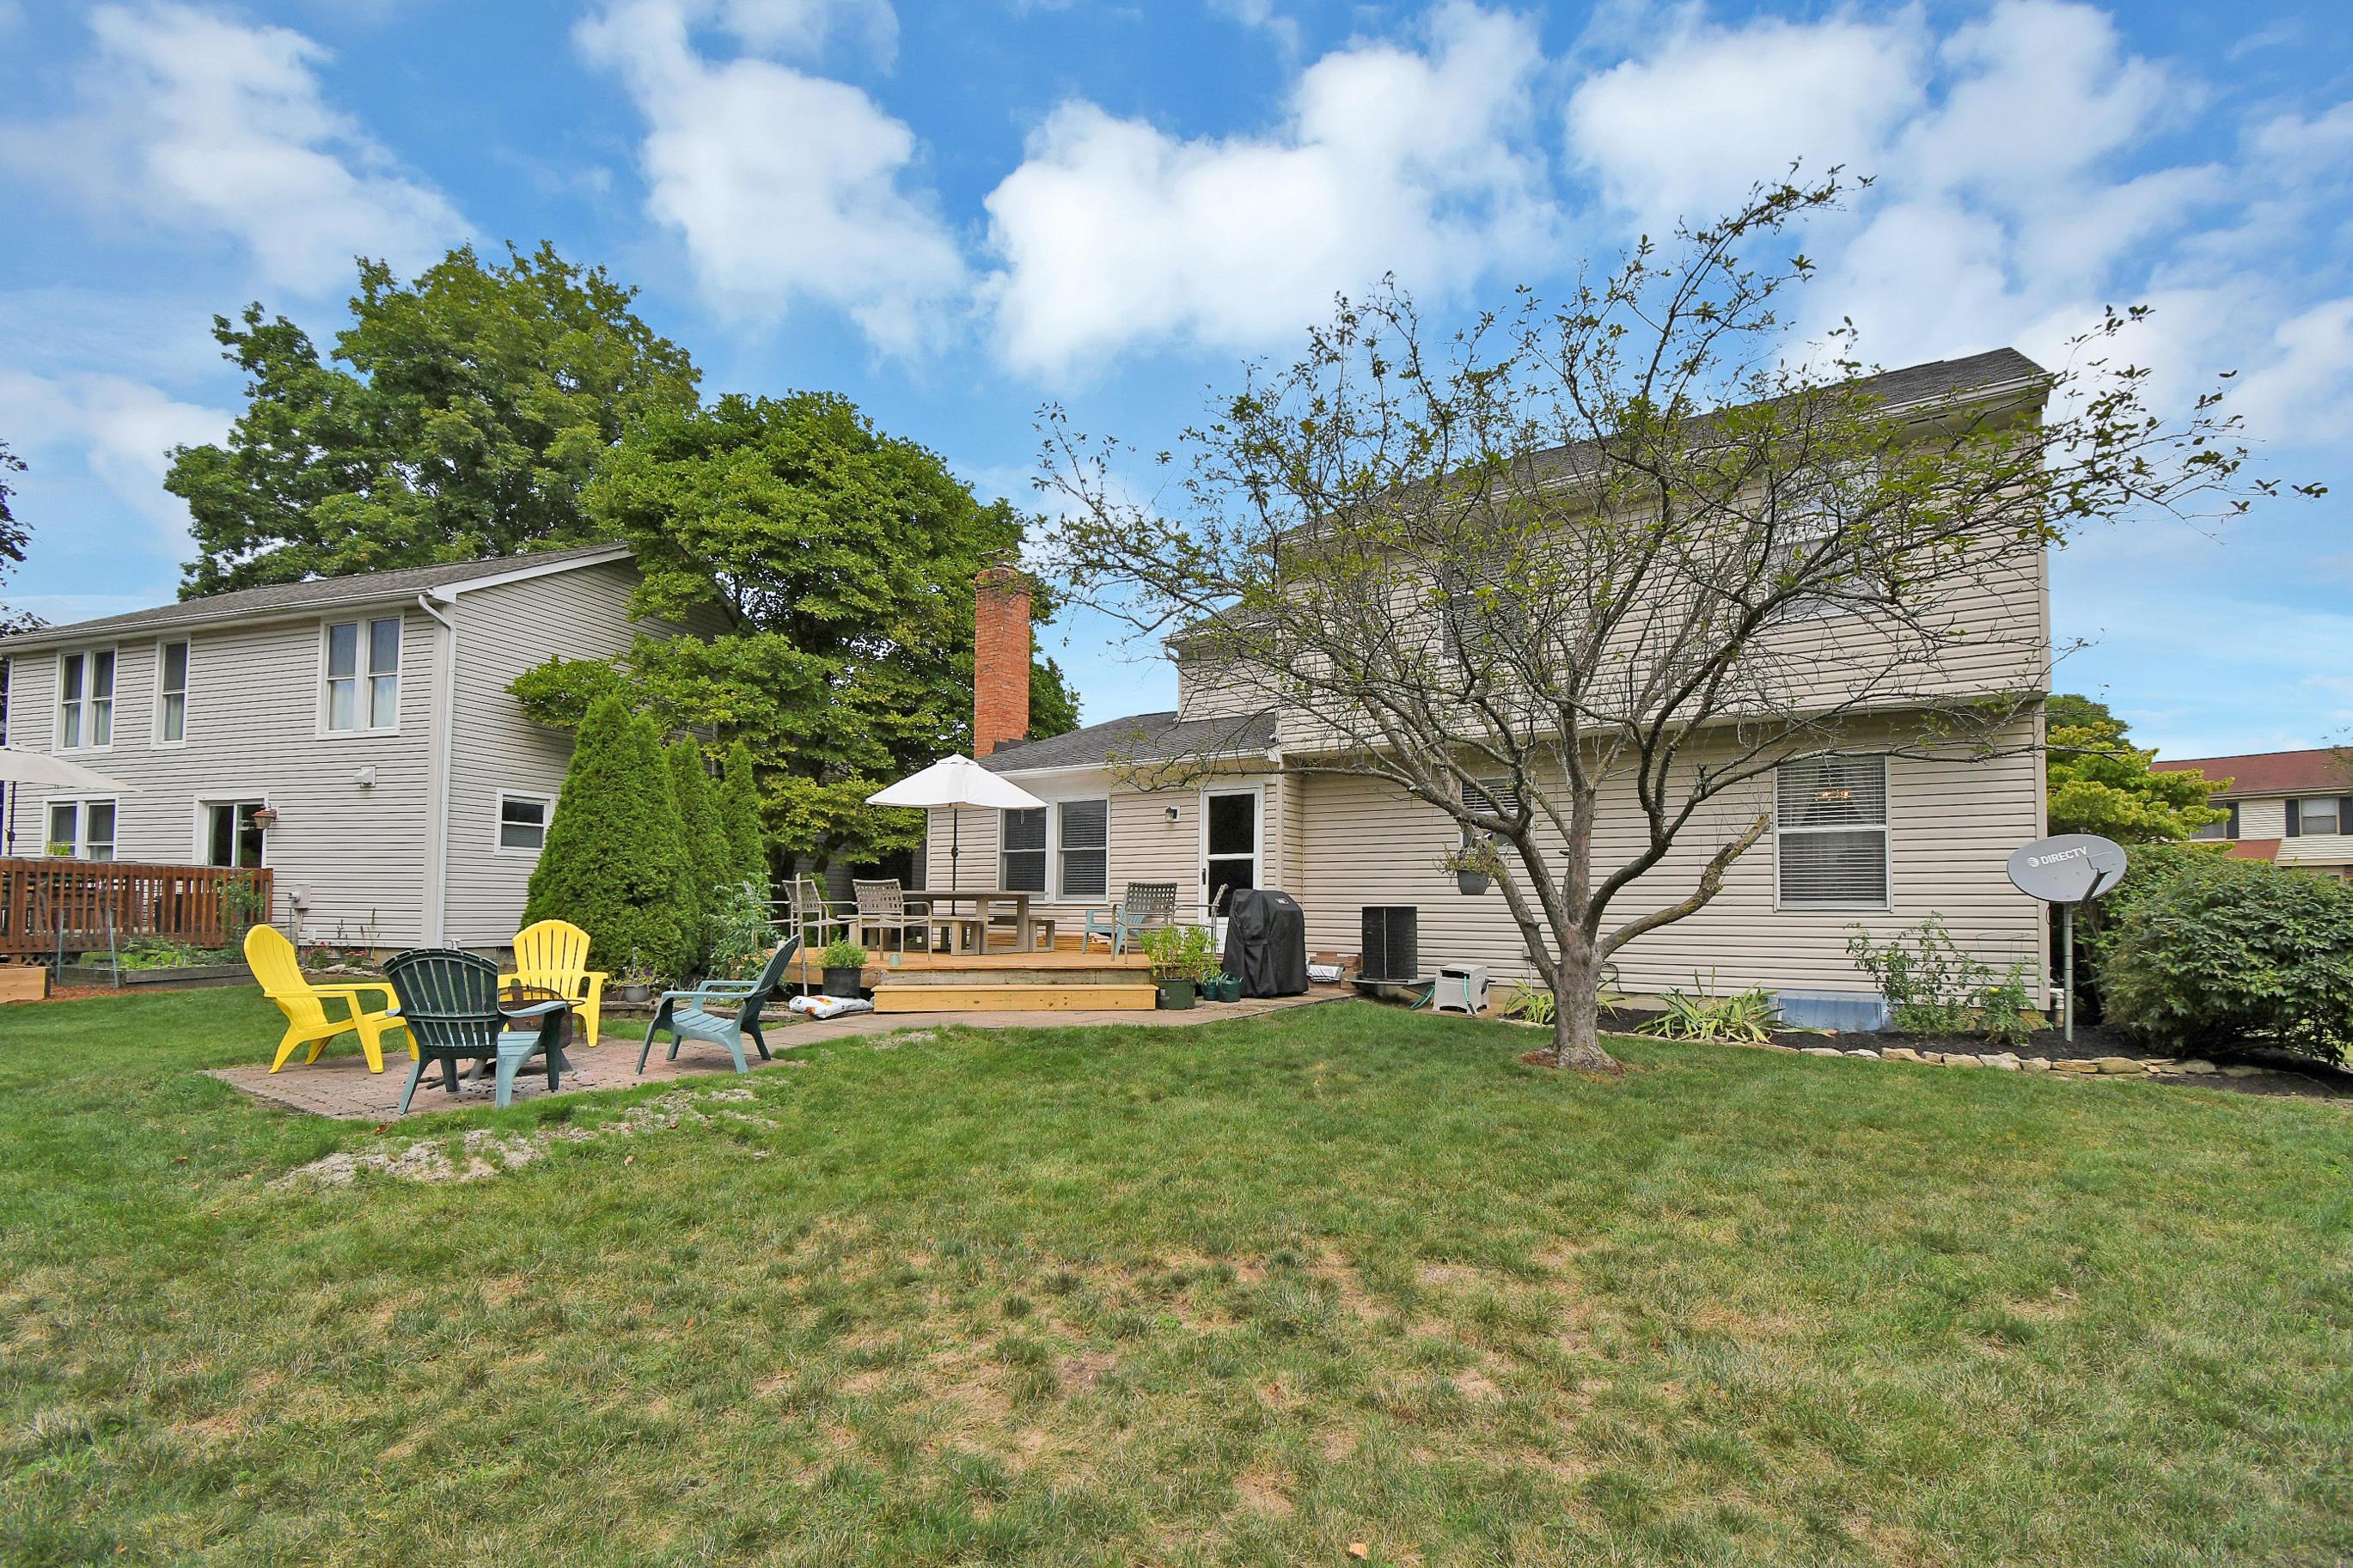 2193 Surrywood Drive, Dublin, Ohio 43016, 4 Bedrooms Bedrooms, ,3 BathroomsBathrooms,Residential,For Sale,Surrywood,220031726